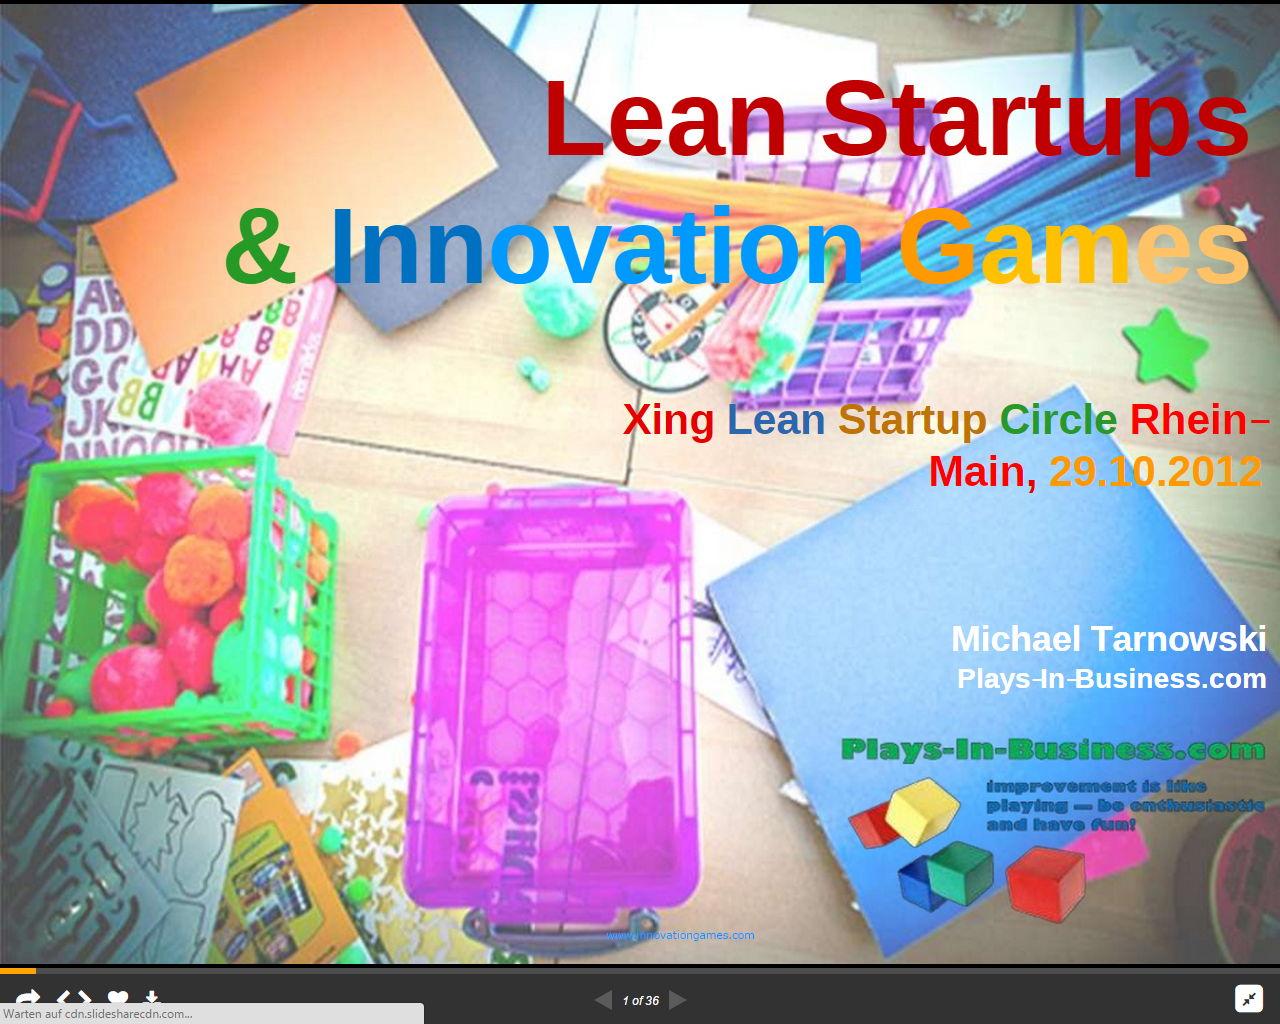 Innovation Games & Lean Startup